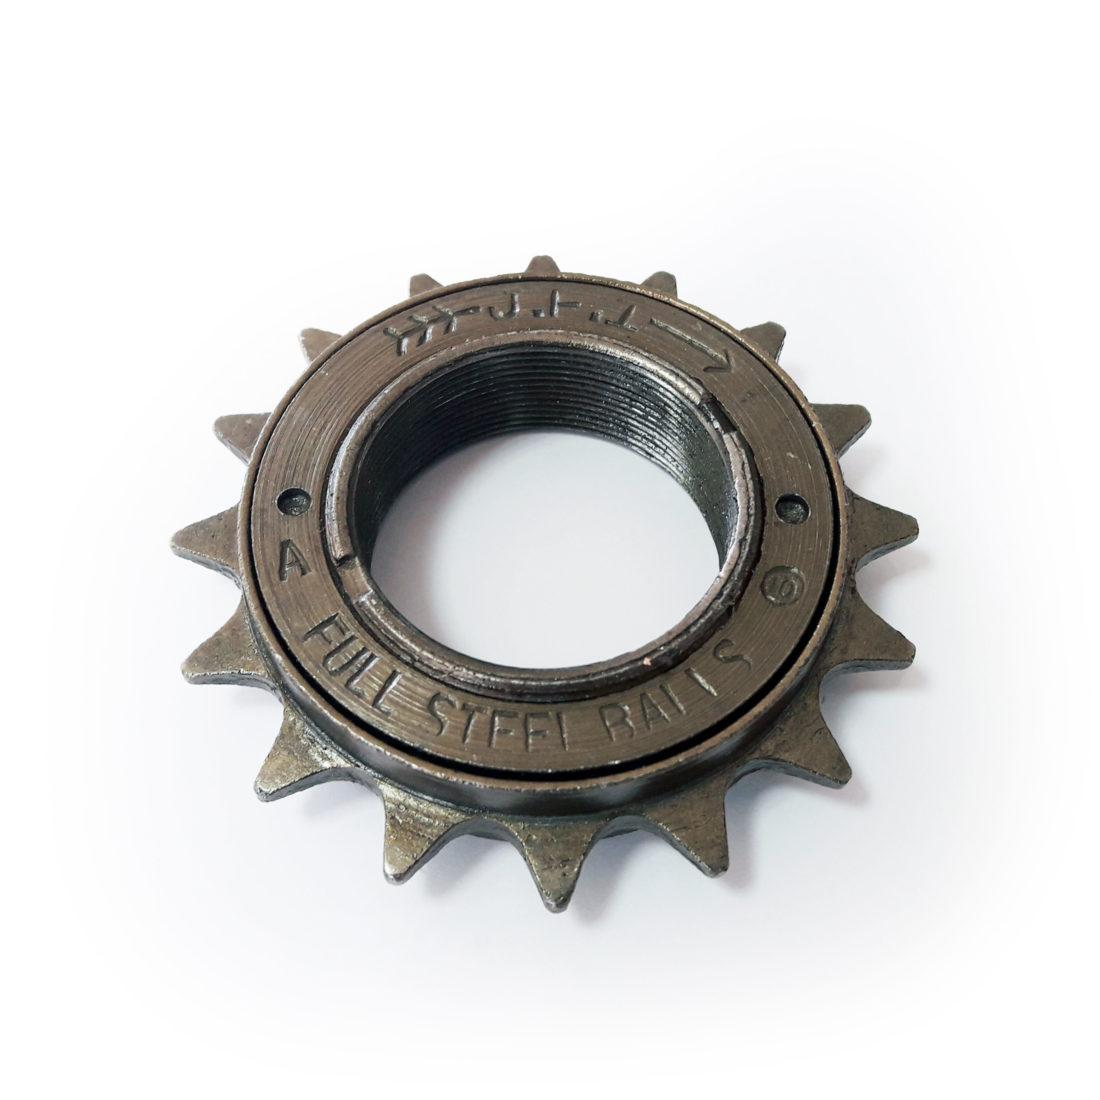 1.0132.0016.0100 - pignone ruota libera z16